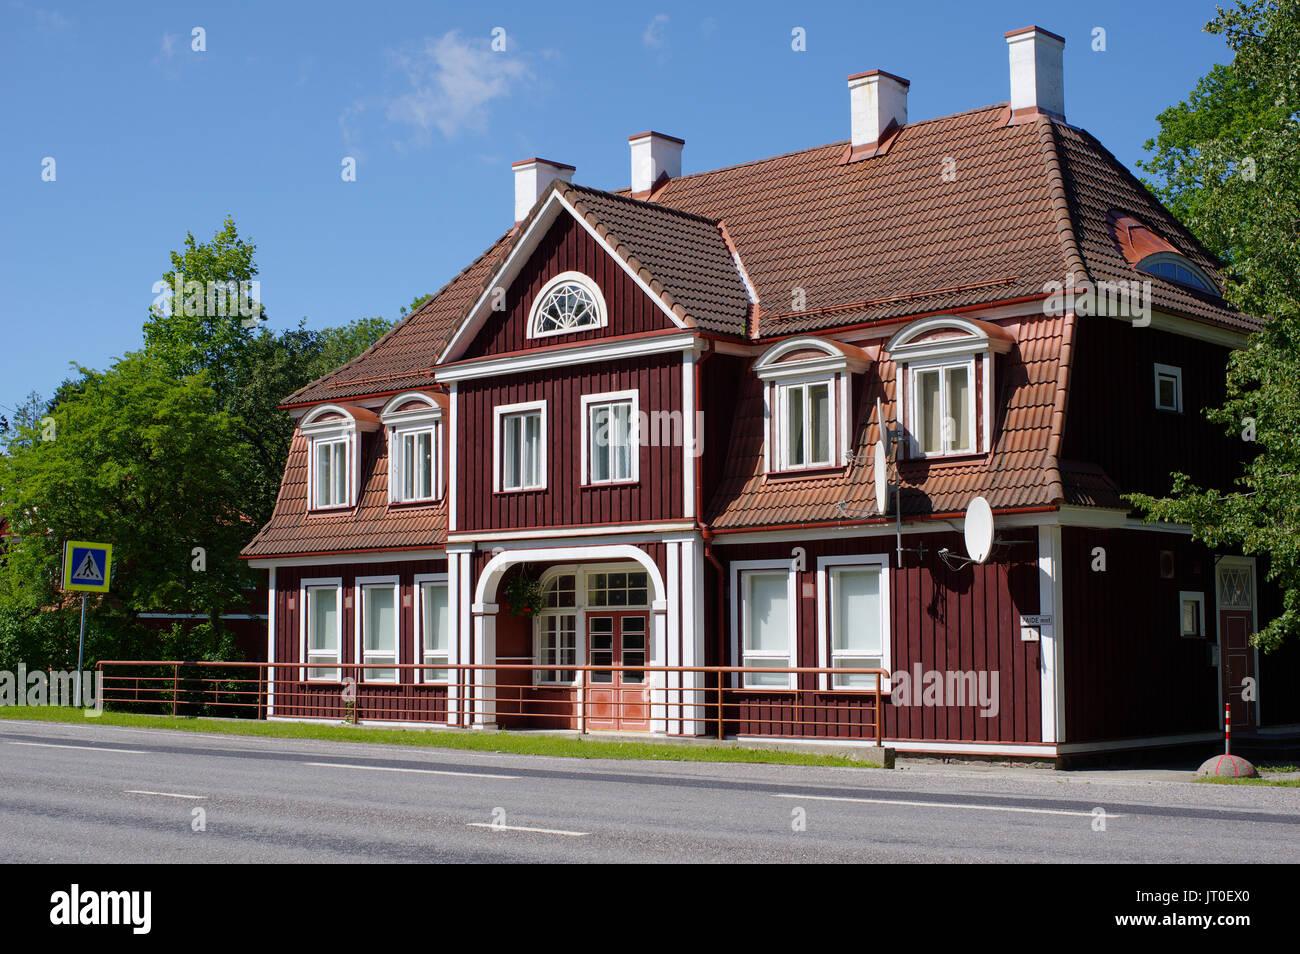 Old Sindi railway station. Estonia, Pärnu county 6th August 2017 - Stock Image